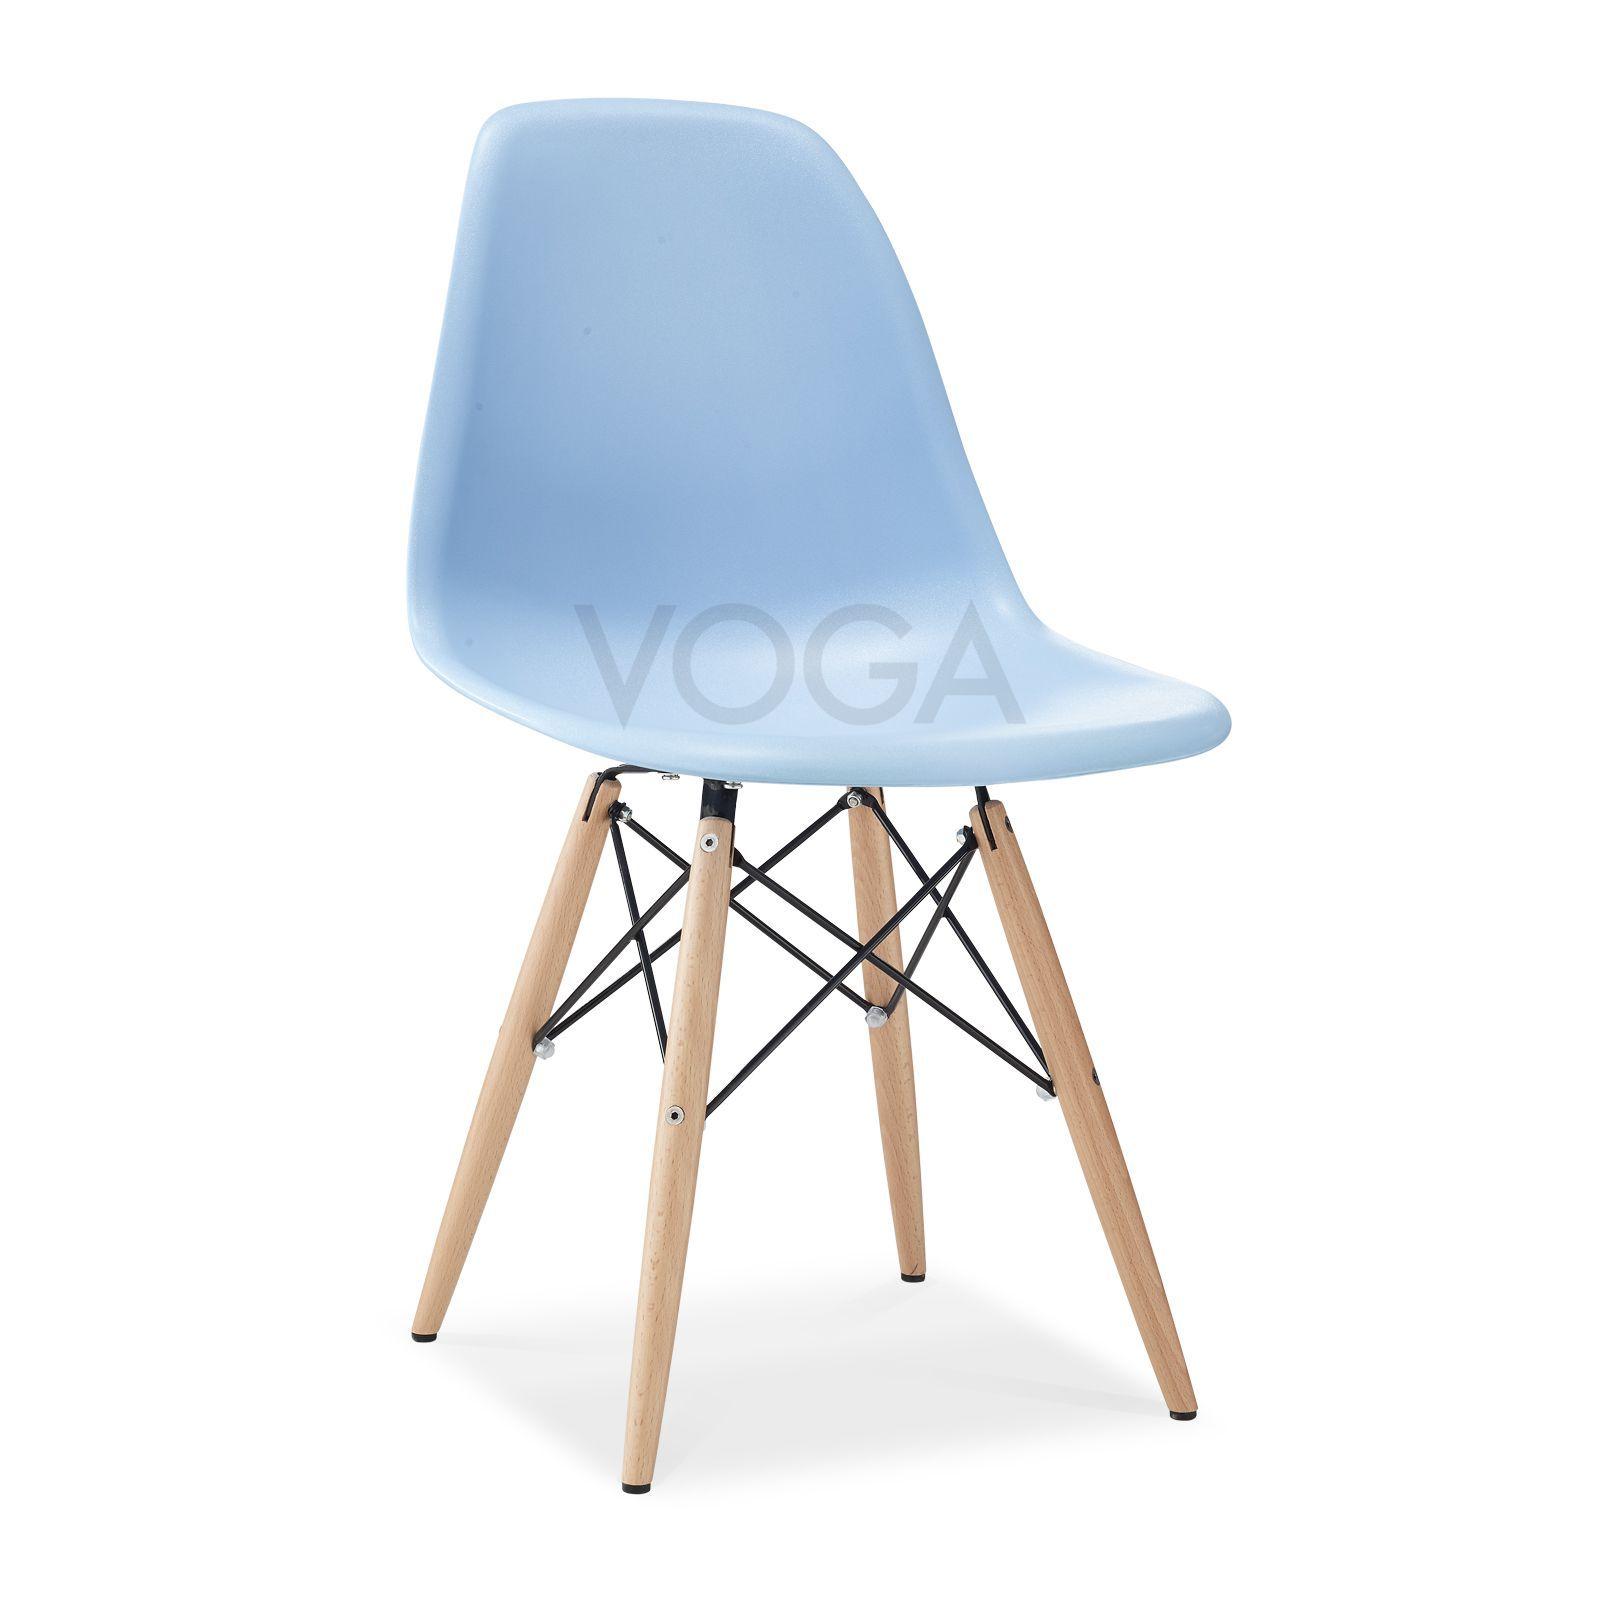 DSW Chair Charles Eames | Sedie di Design | VOGA | Cucine e dintorni ...